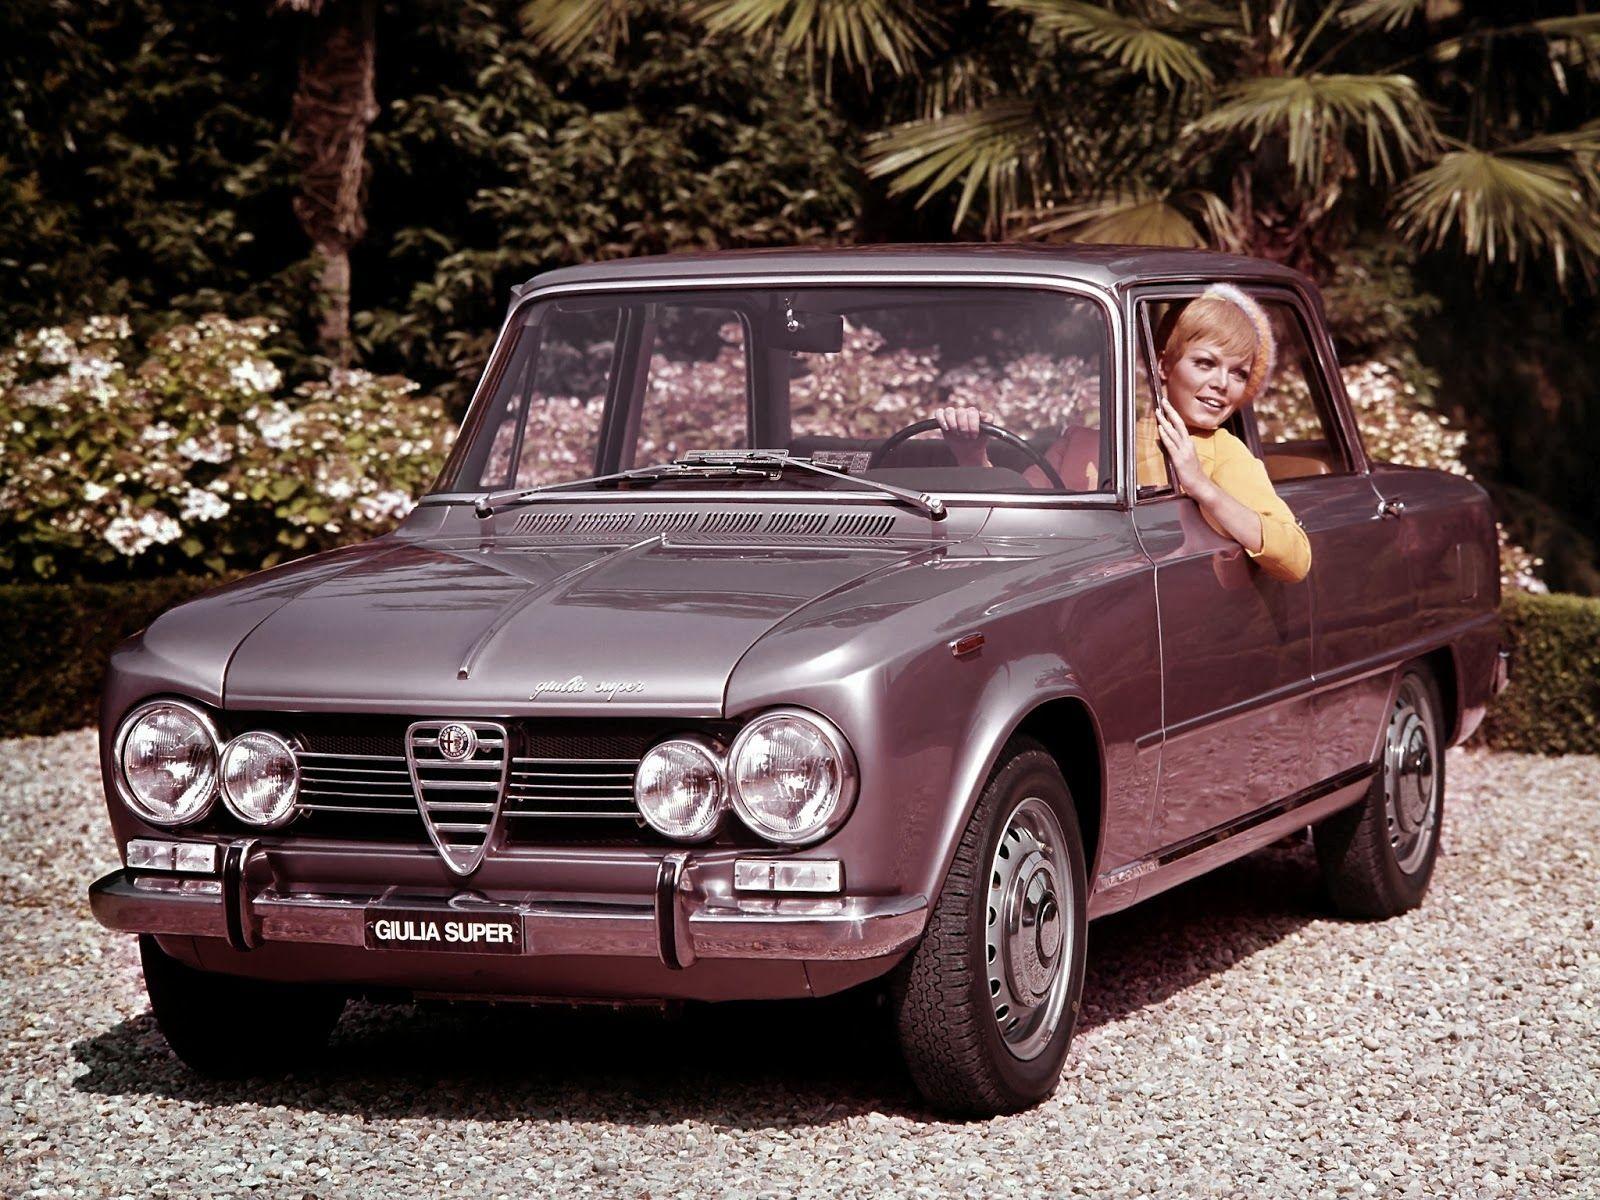 STORMWHEELS: Alfa Romeo - La GIulia Super e la bionda - The Giu...